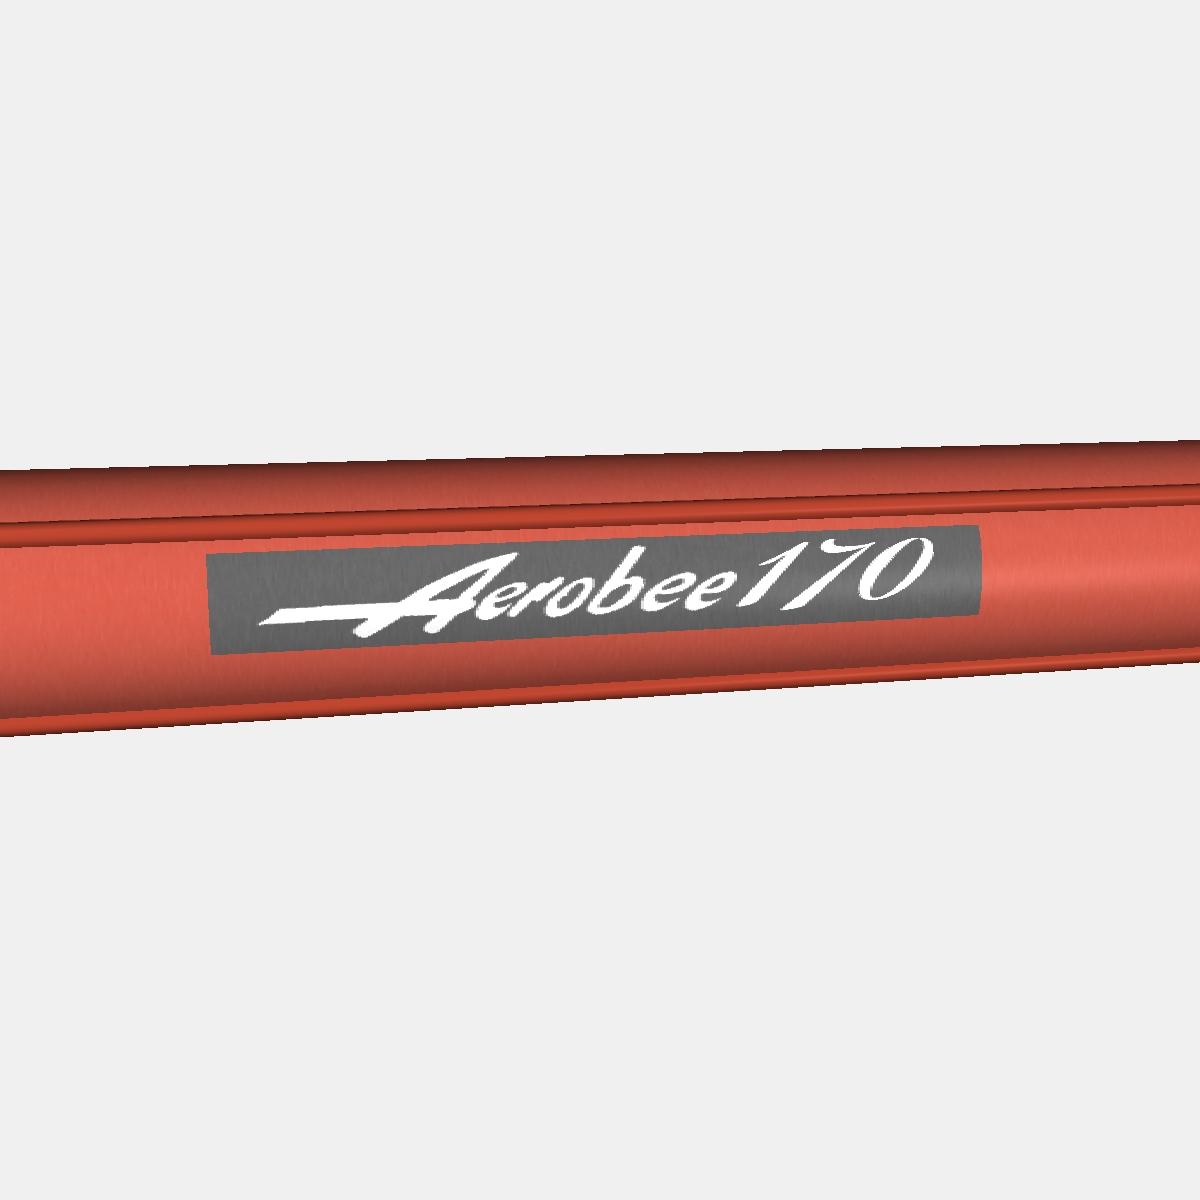 aerobee 170 rocket 3d model 3ds dxf fbx blend cob dae x  obj 166039